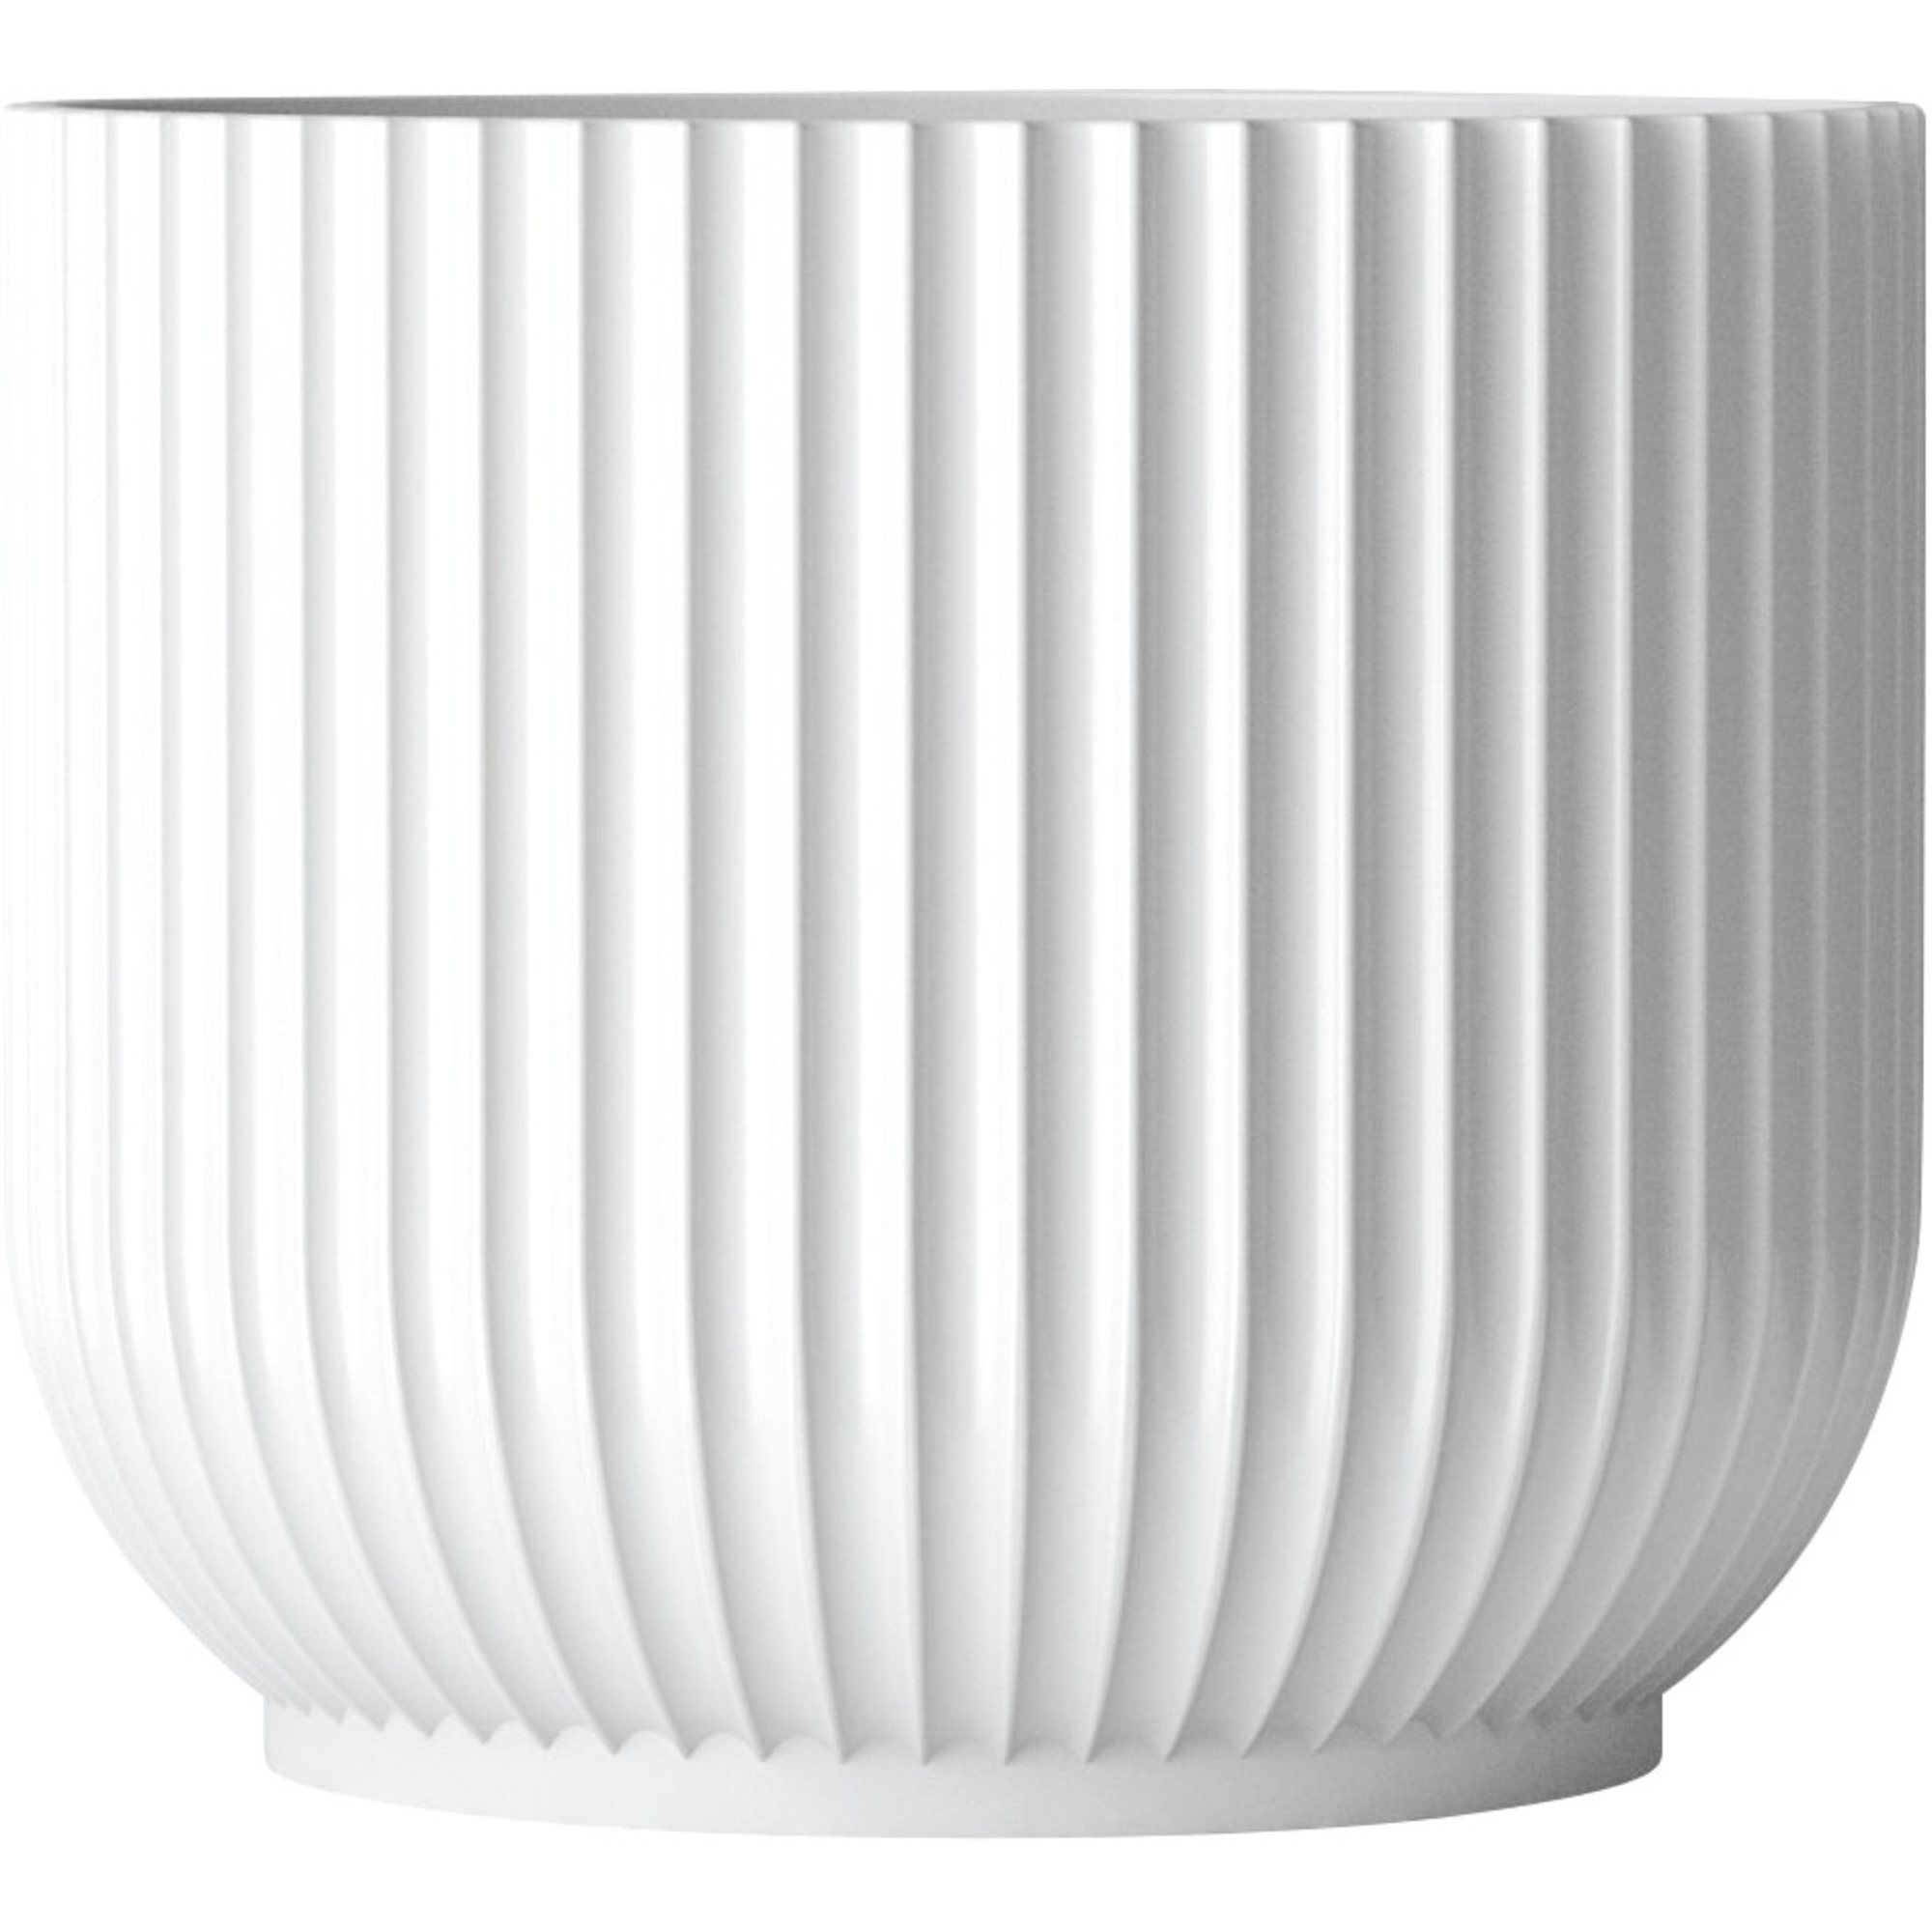 Lyngby Porcelæn Flowerpot stor (H 189 x Ø 18 cm.)